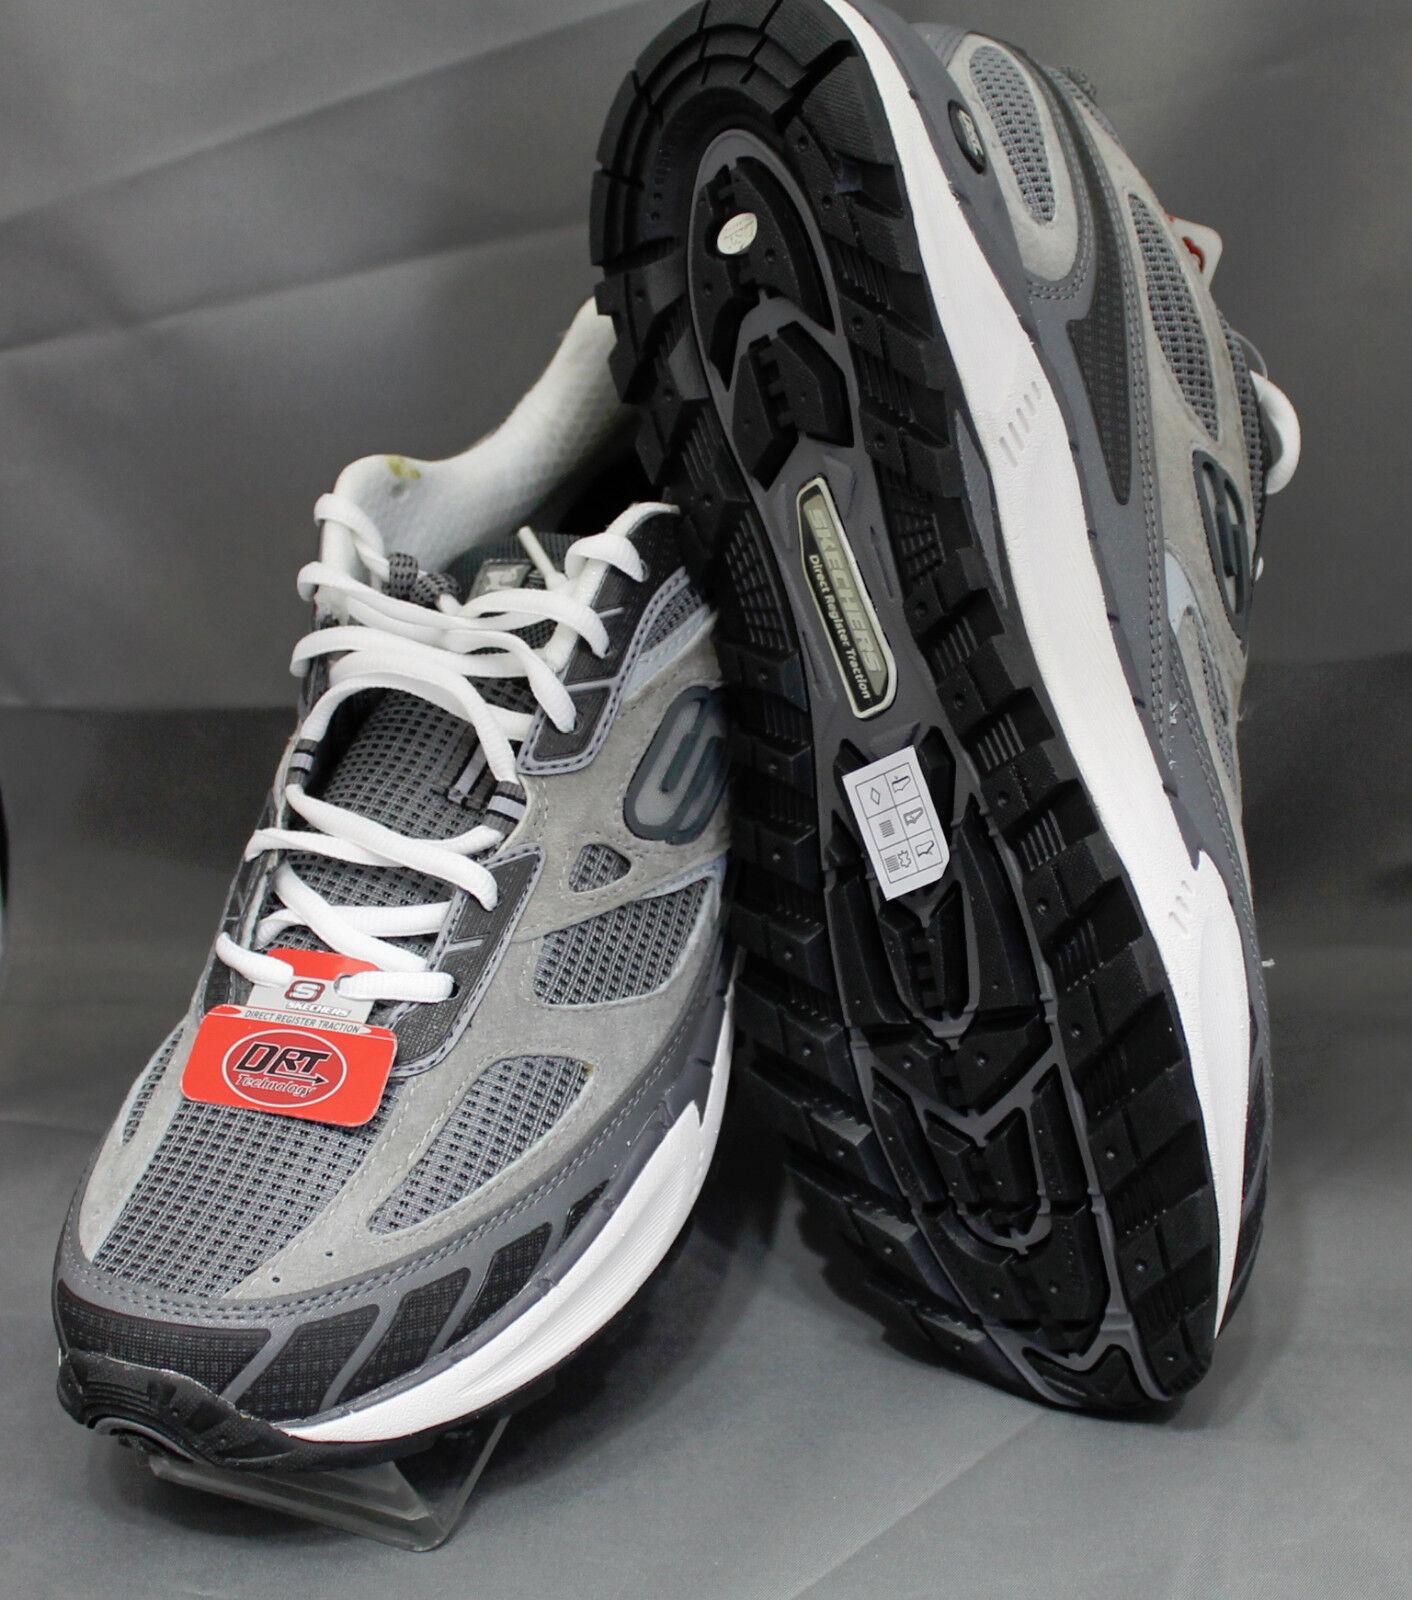 Herren Skechers Bobcat 50946/CCBK Walking Schuhe - 50946/CCBK Bobcat 1865f9